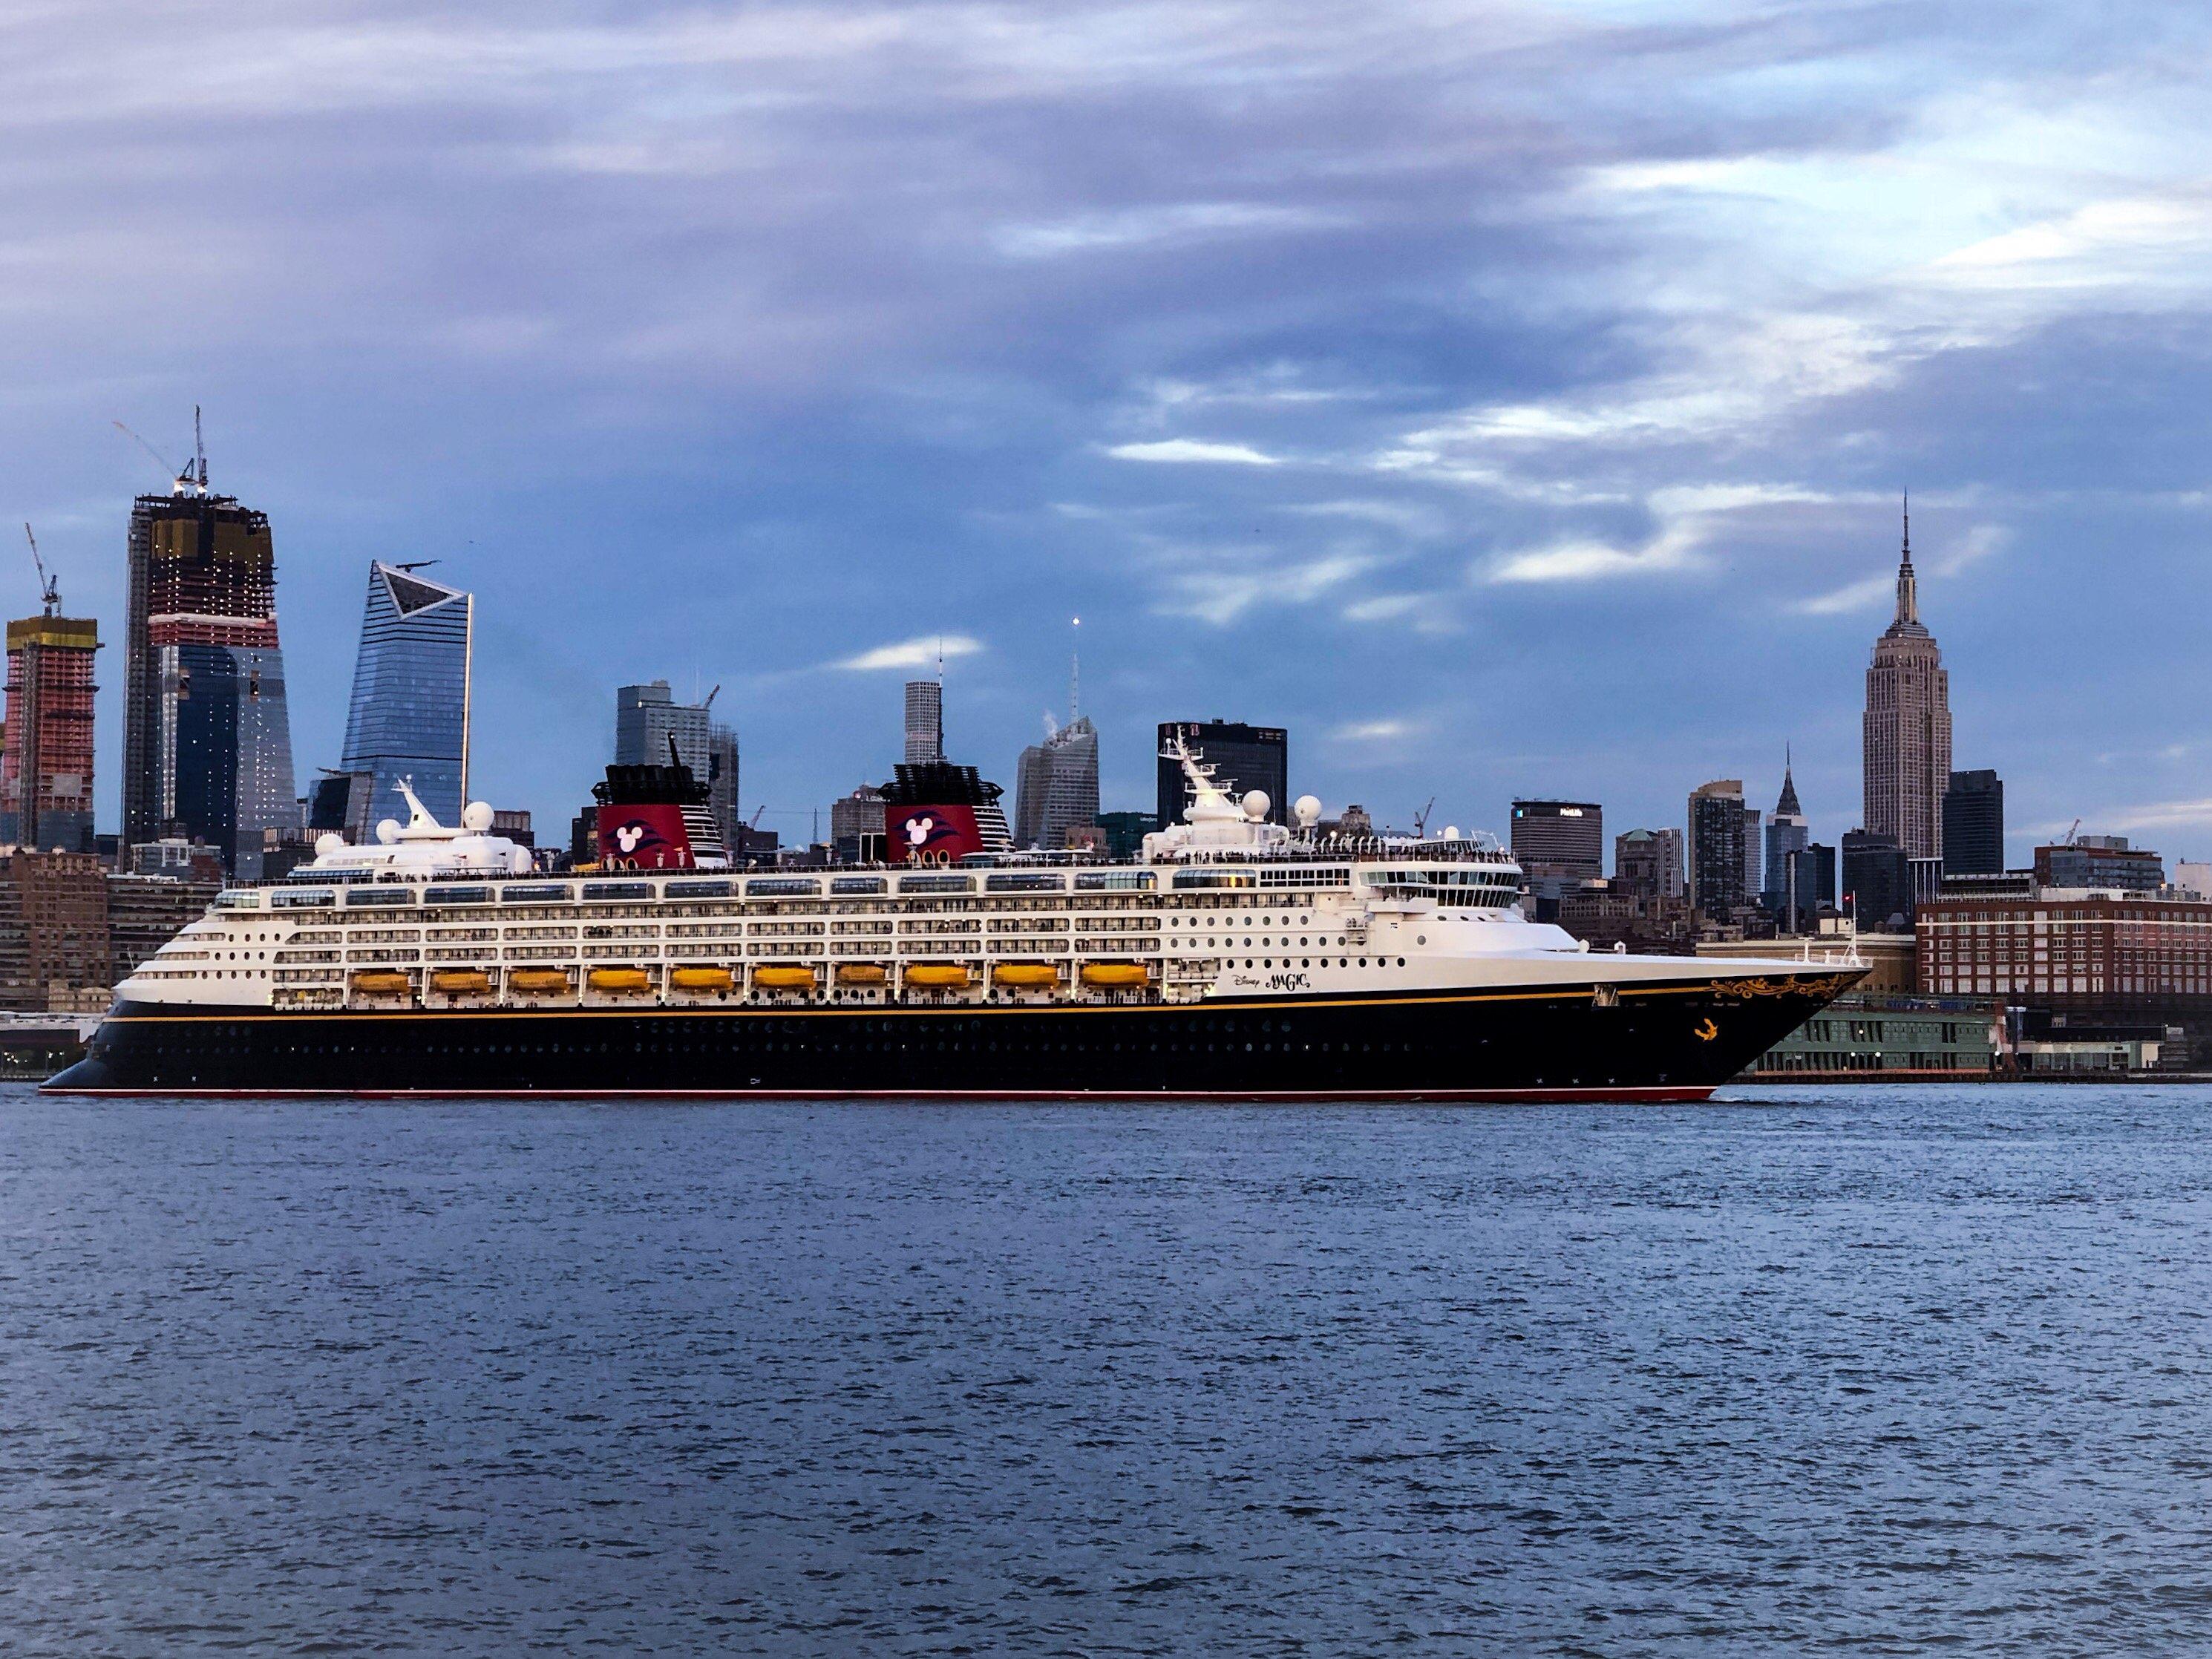 Disney cruise on the Hudson